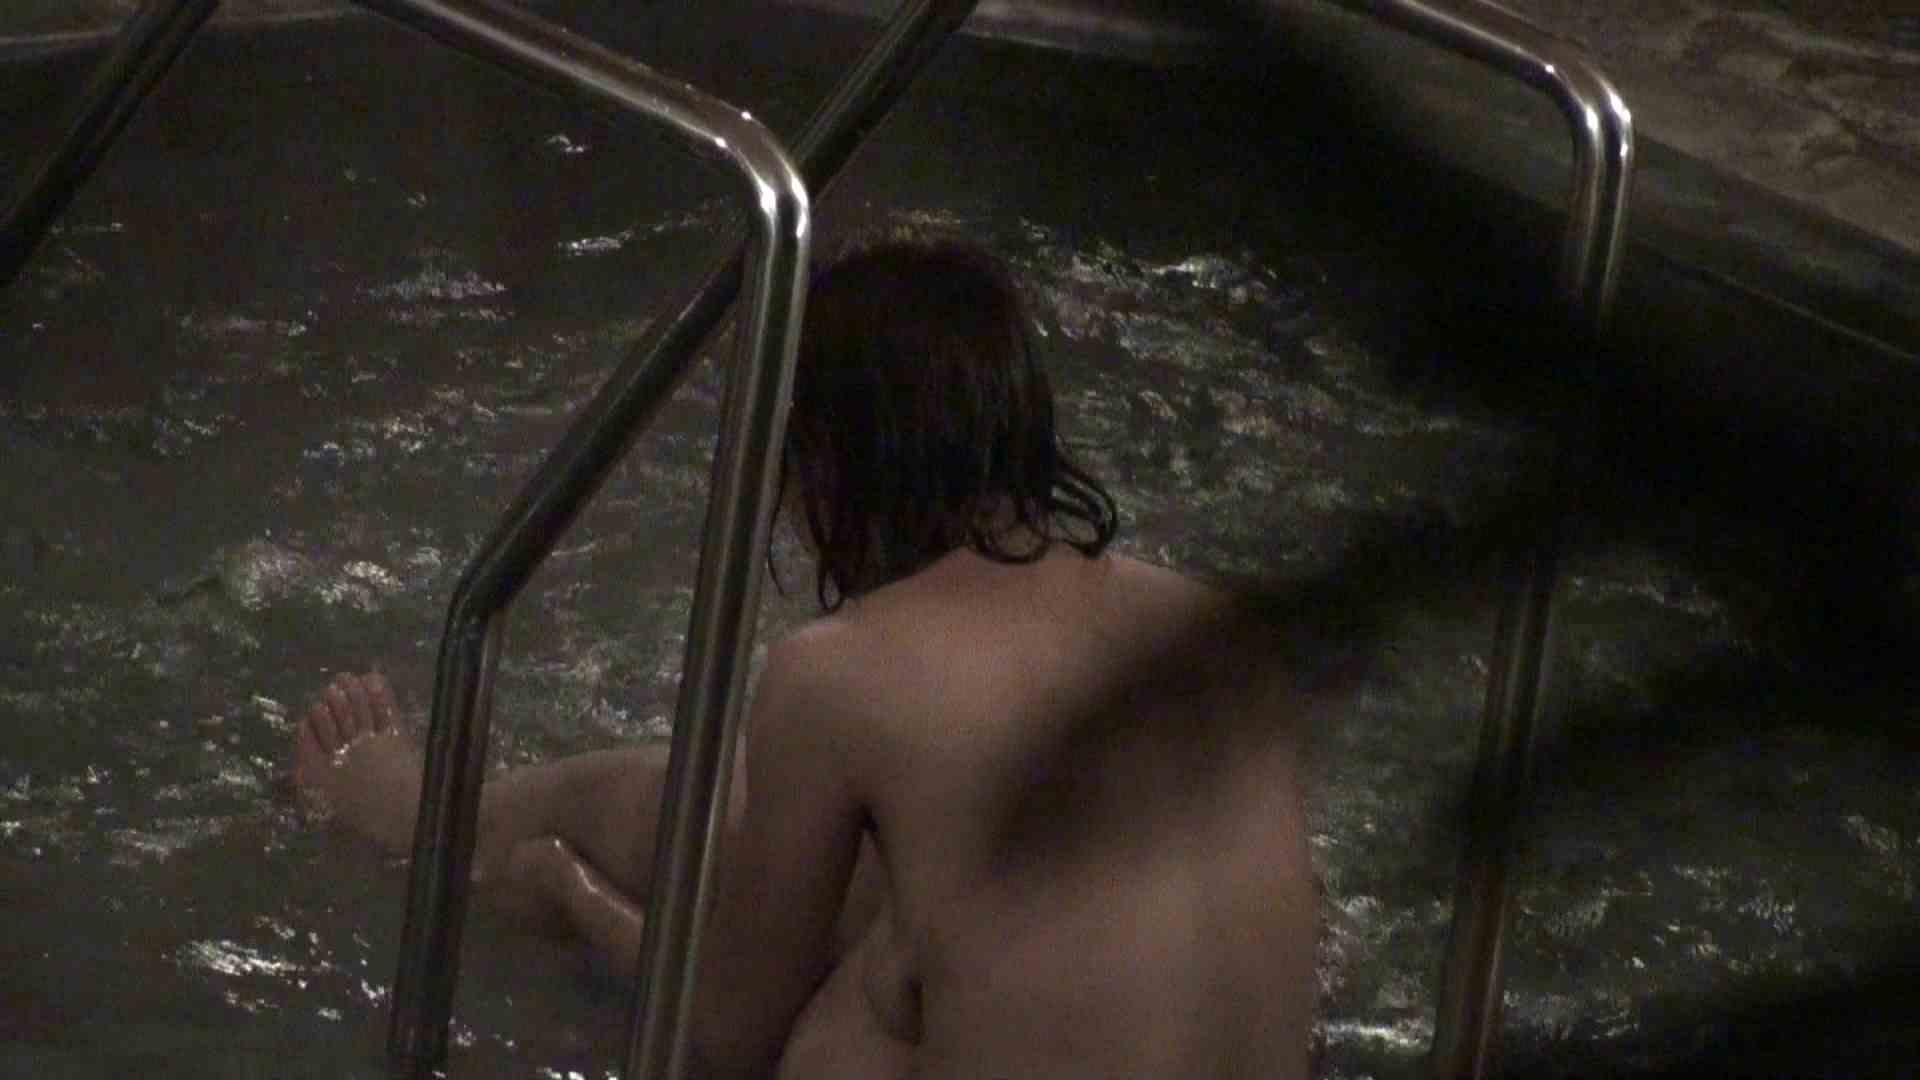 Aquaな露天風呂Vol.392 盗撮 オマンコ無修正動画無料 96画像 53